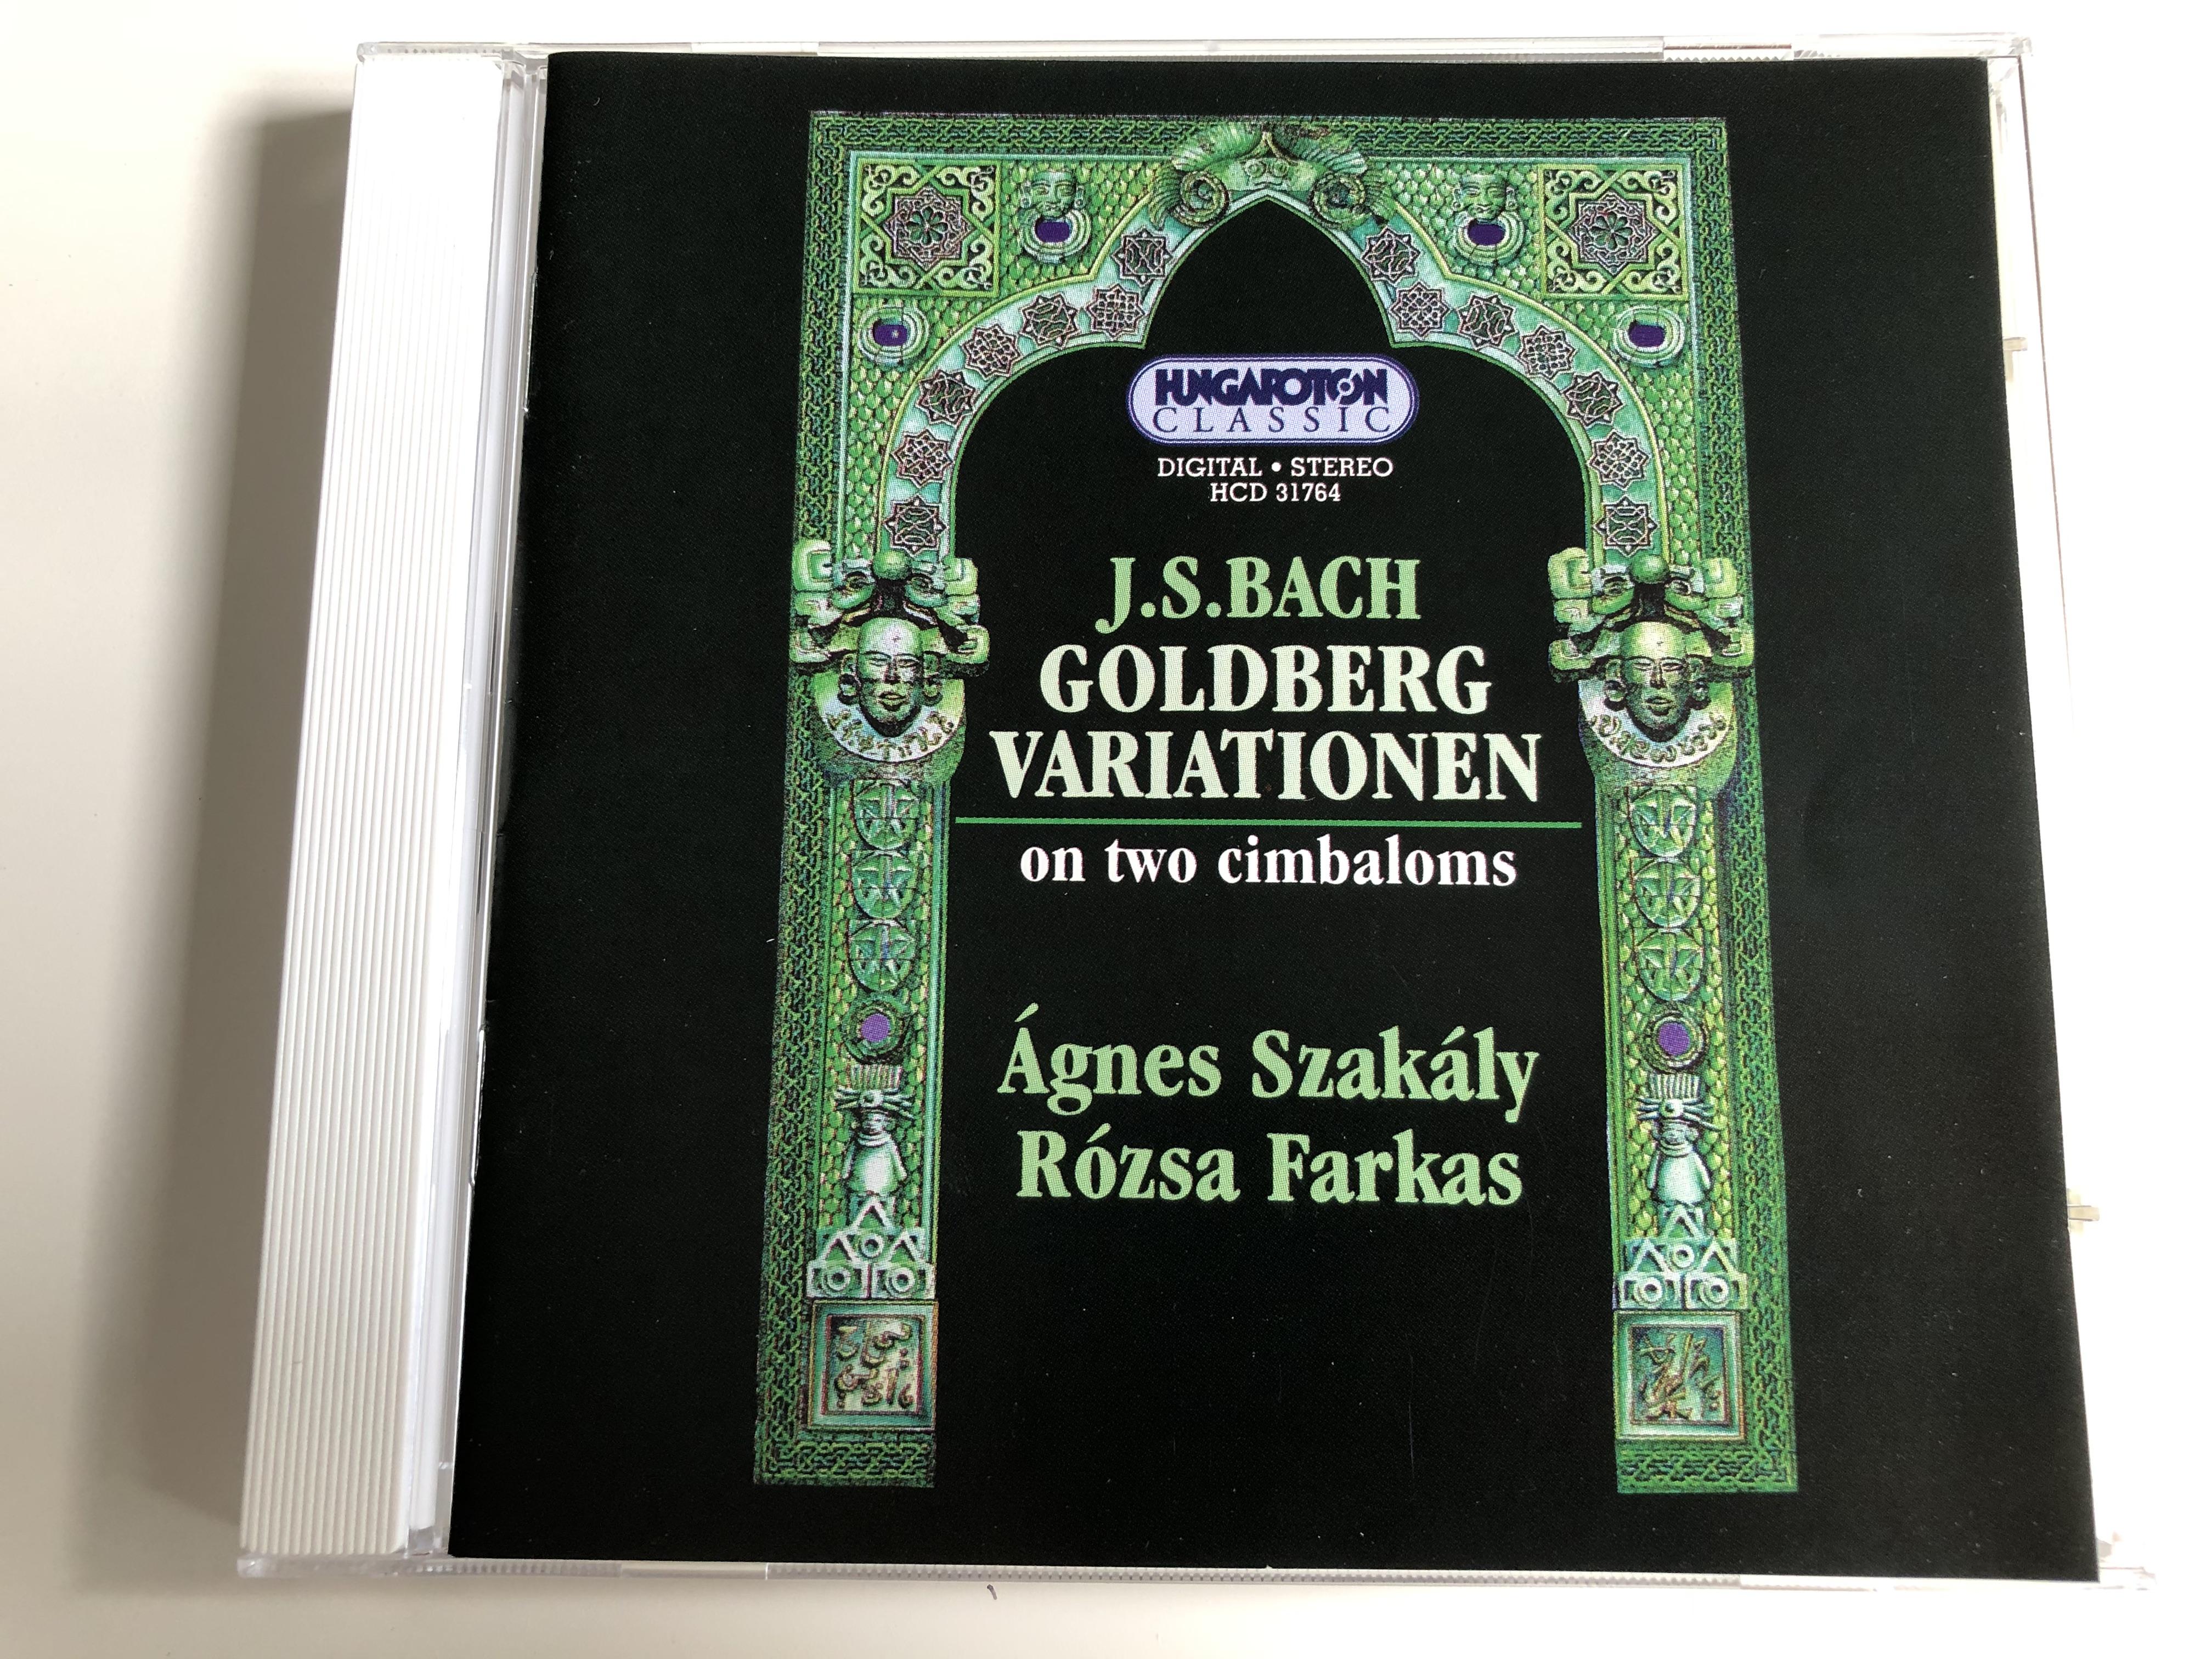 j.-s.-bach-goldberg-variationen-on-two-cymbalos-gnes-szak-ly-r-zsa-farkas-audio-cd-1998-hungaroton-hcd-31764-1-.jpg